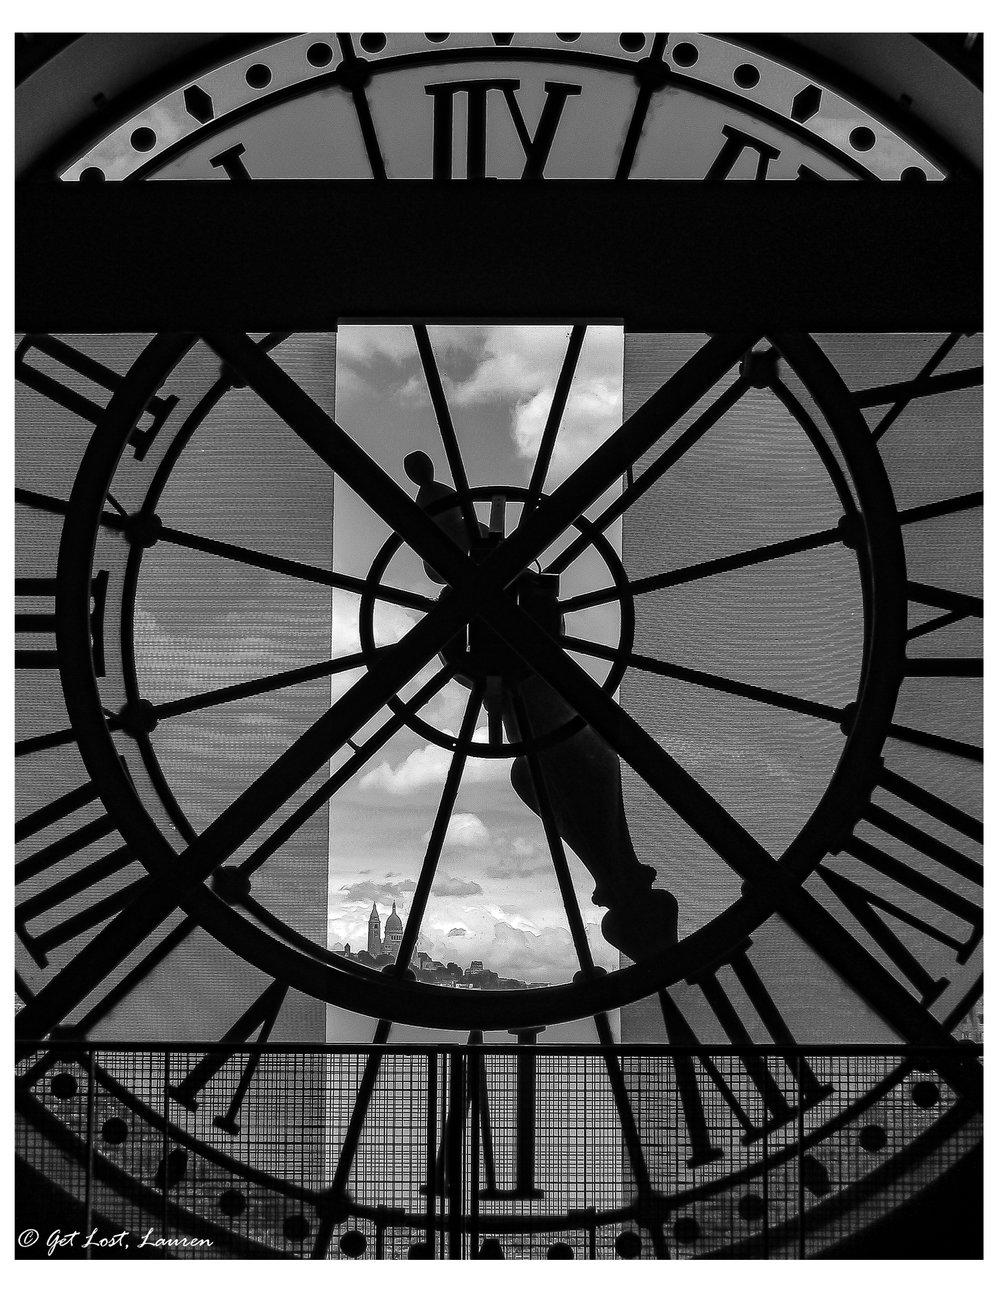 The Sacre Coeur peeking through the clock at the Orsay.